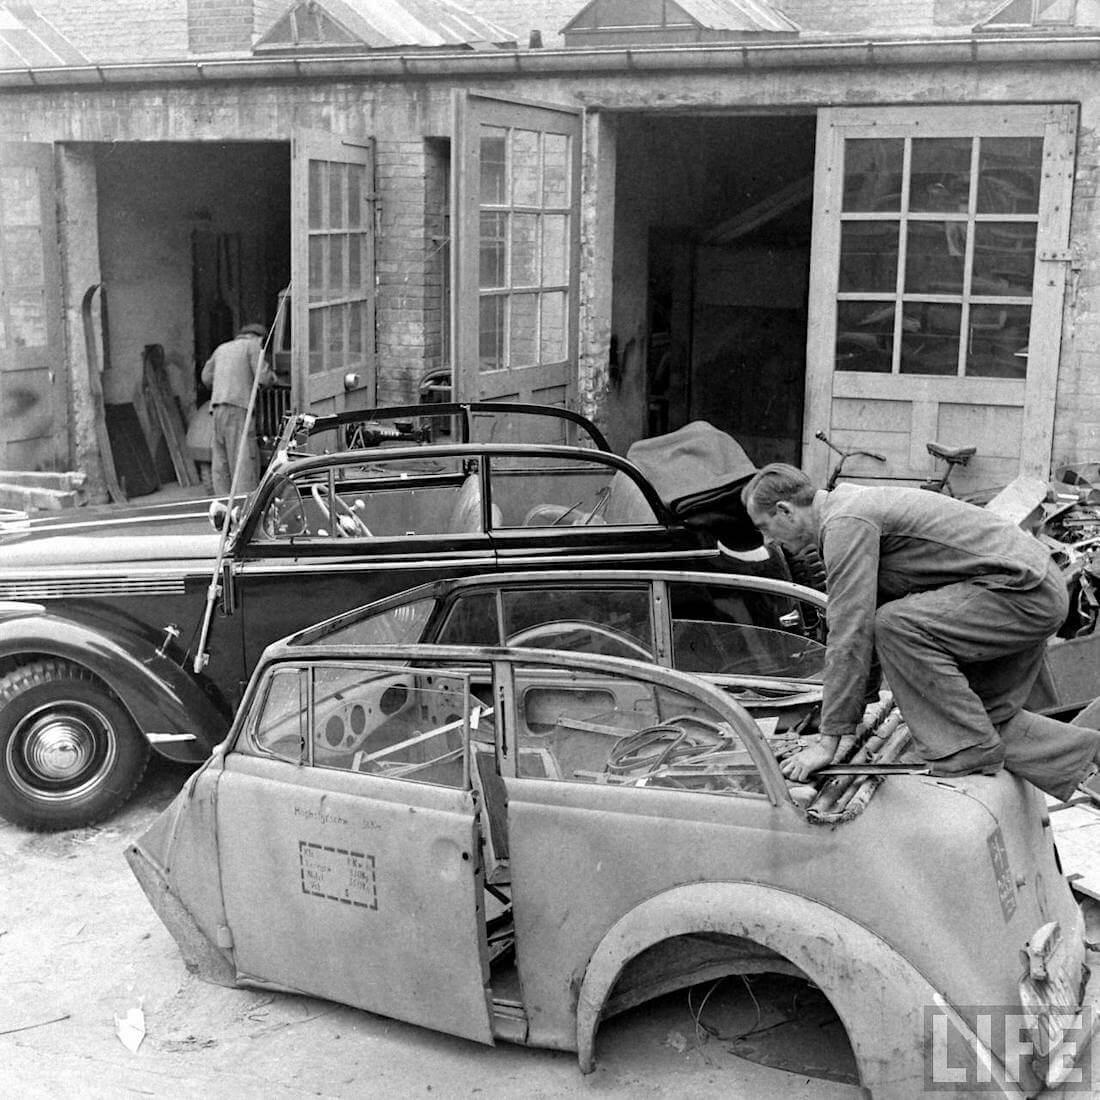 Opel Olympia Cabrion korihylsy metallipajan pihalla. Kuva: Walter Sanders/Life.